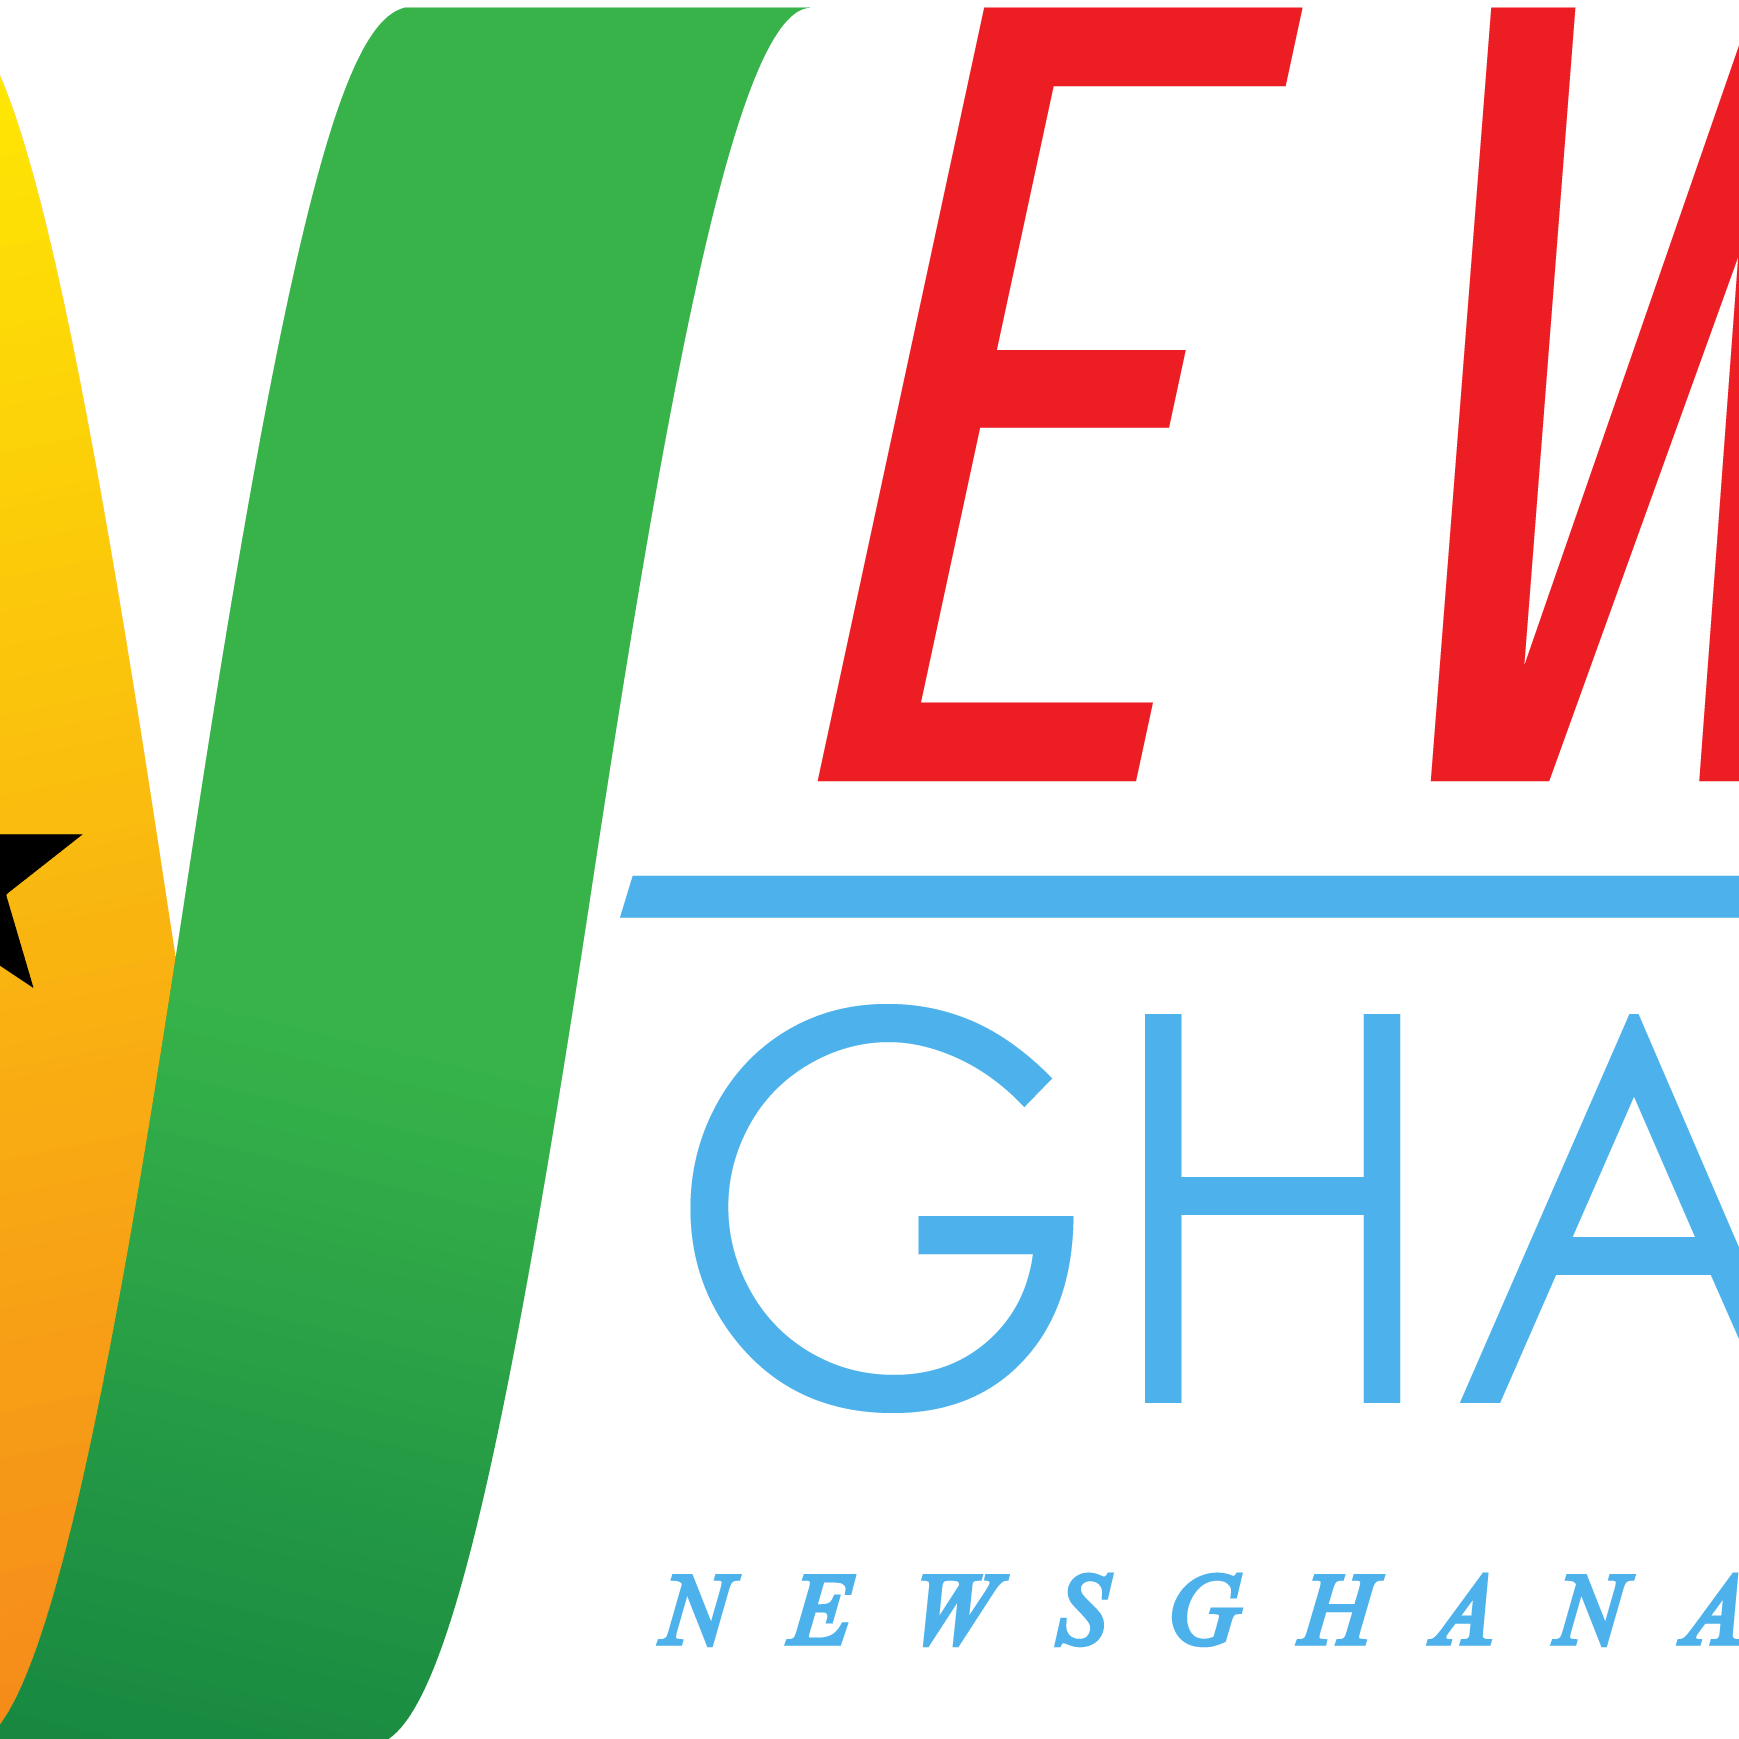 Mobile Money agents want bullion vans for cash conveyance | News Ghana